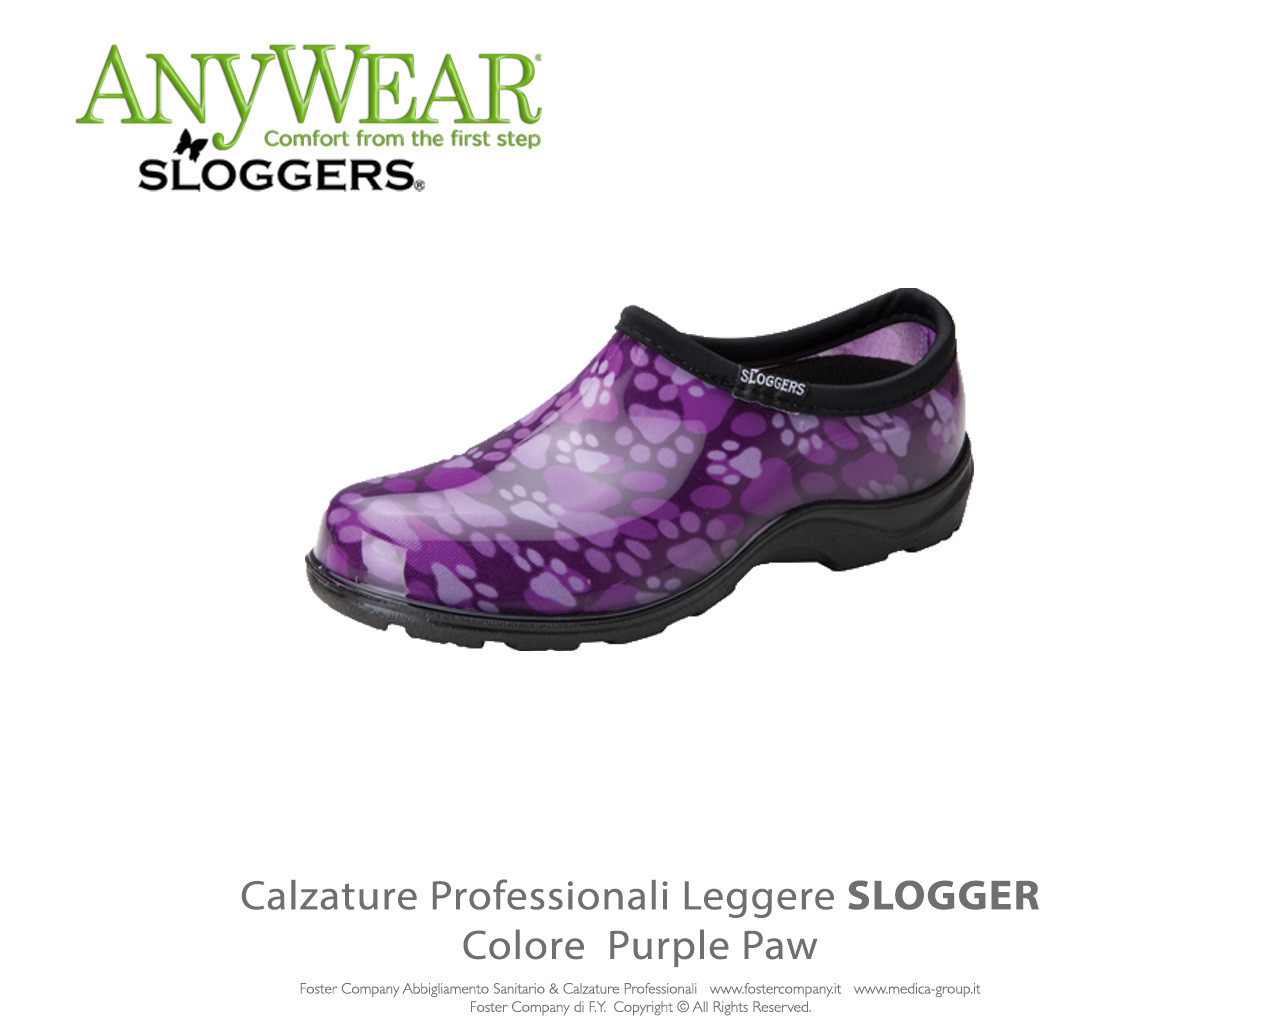 Calzature Professionali Anywear SLOGGER Colore Purple Paw